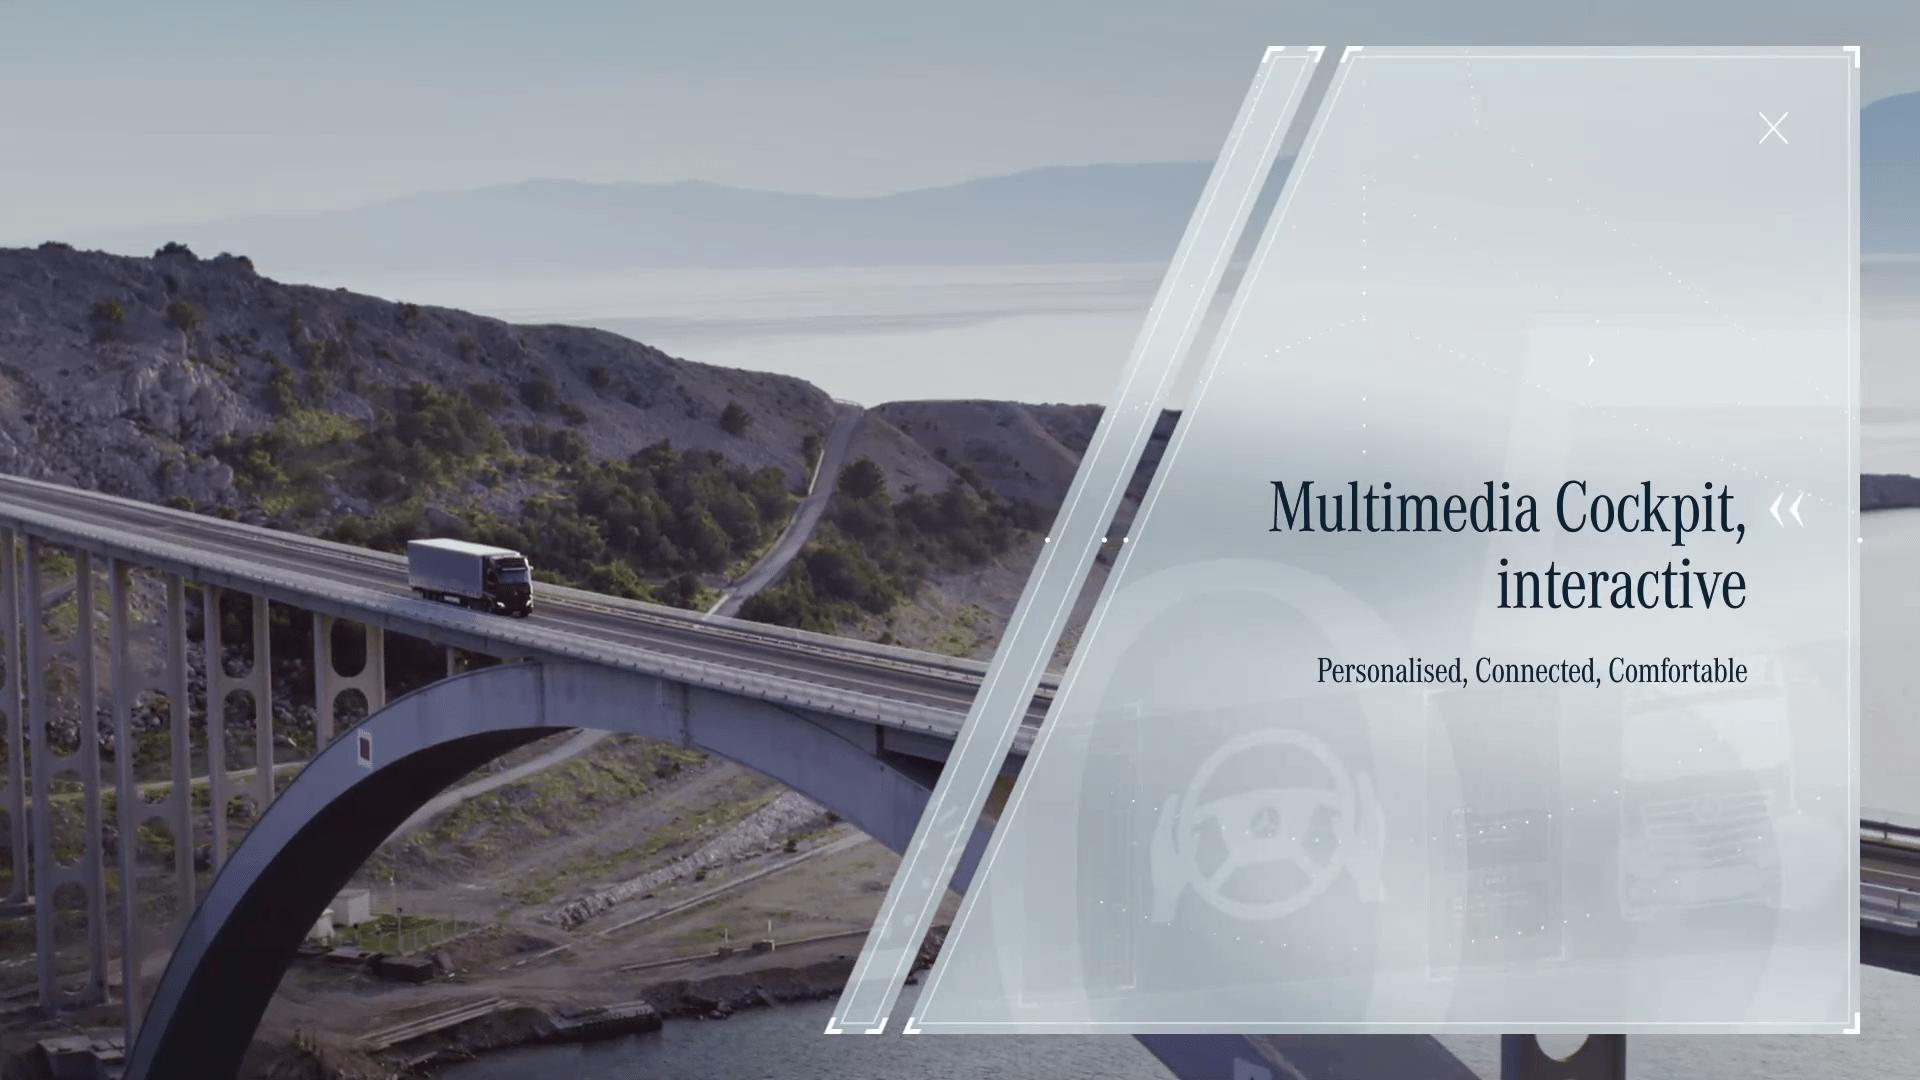 Multimedia Cockpit Interactive